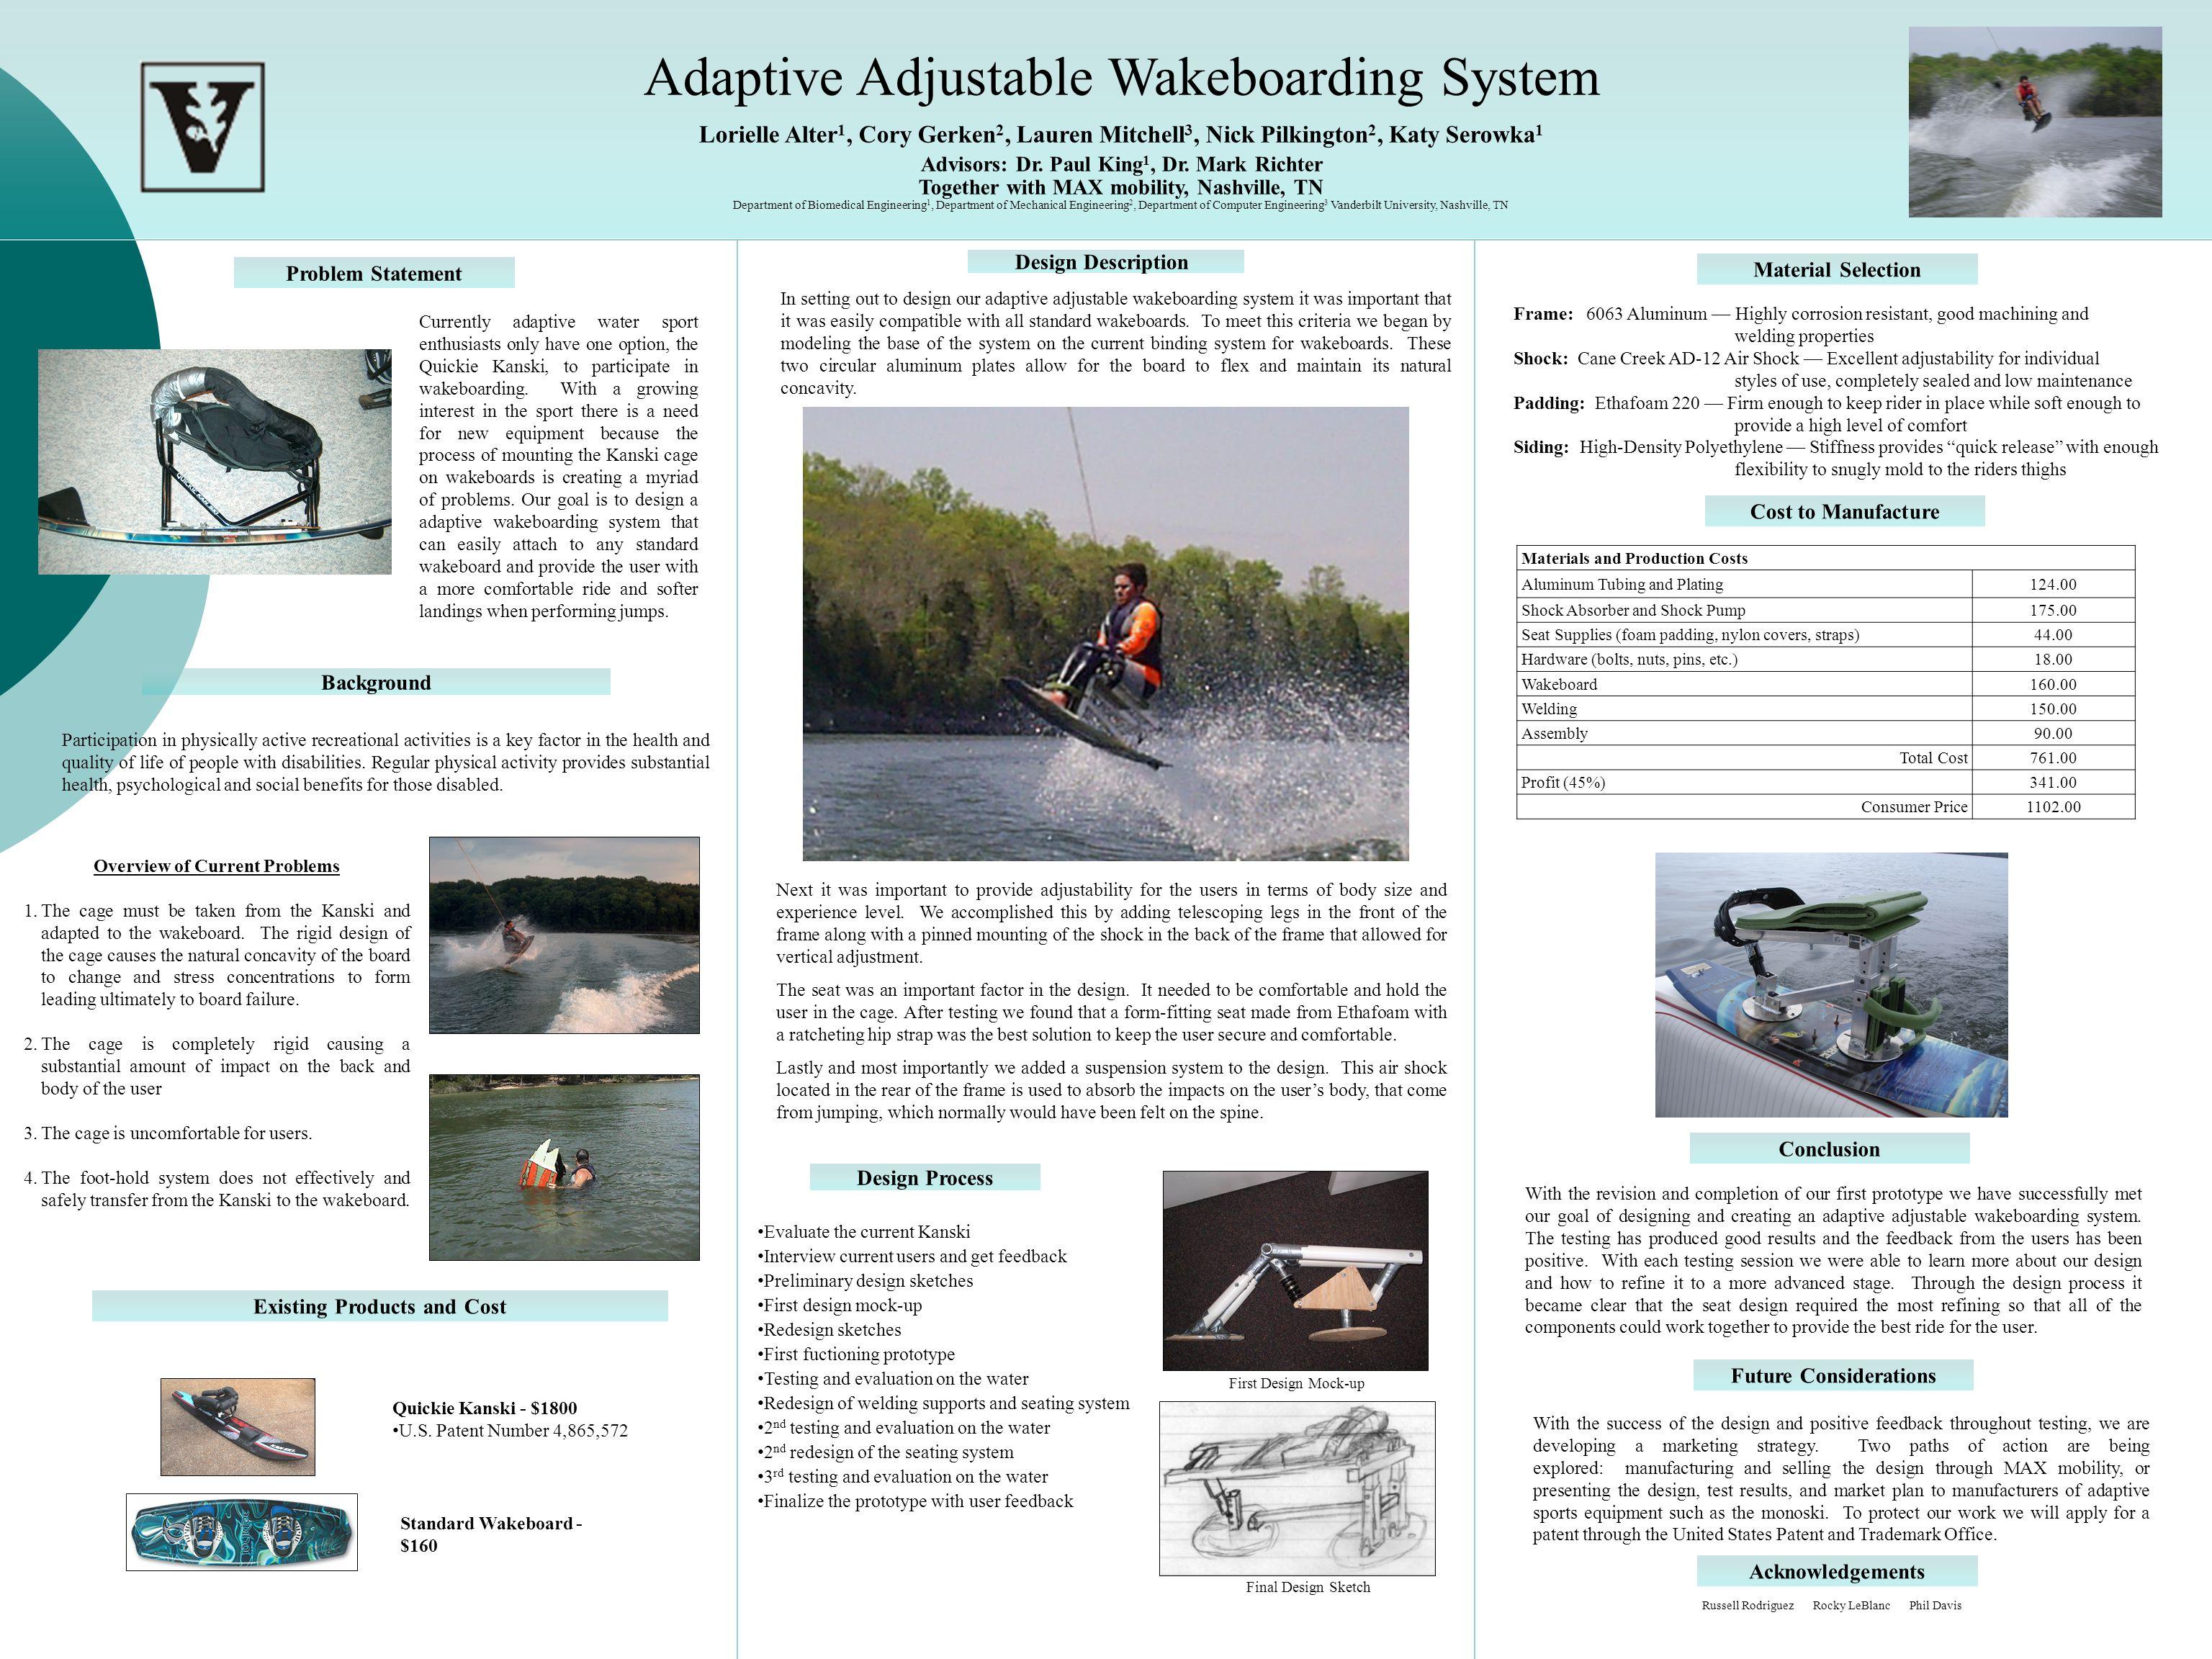 Adaptive Adjustable Wakeboarding System Lorielle Alter 1, Cory Gerken 2, Lauren Mitchell 3, Nick Pilkington 2, Katy Serowka 1 Advisors: Dr.